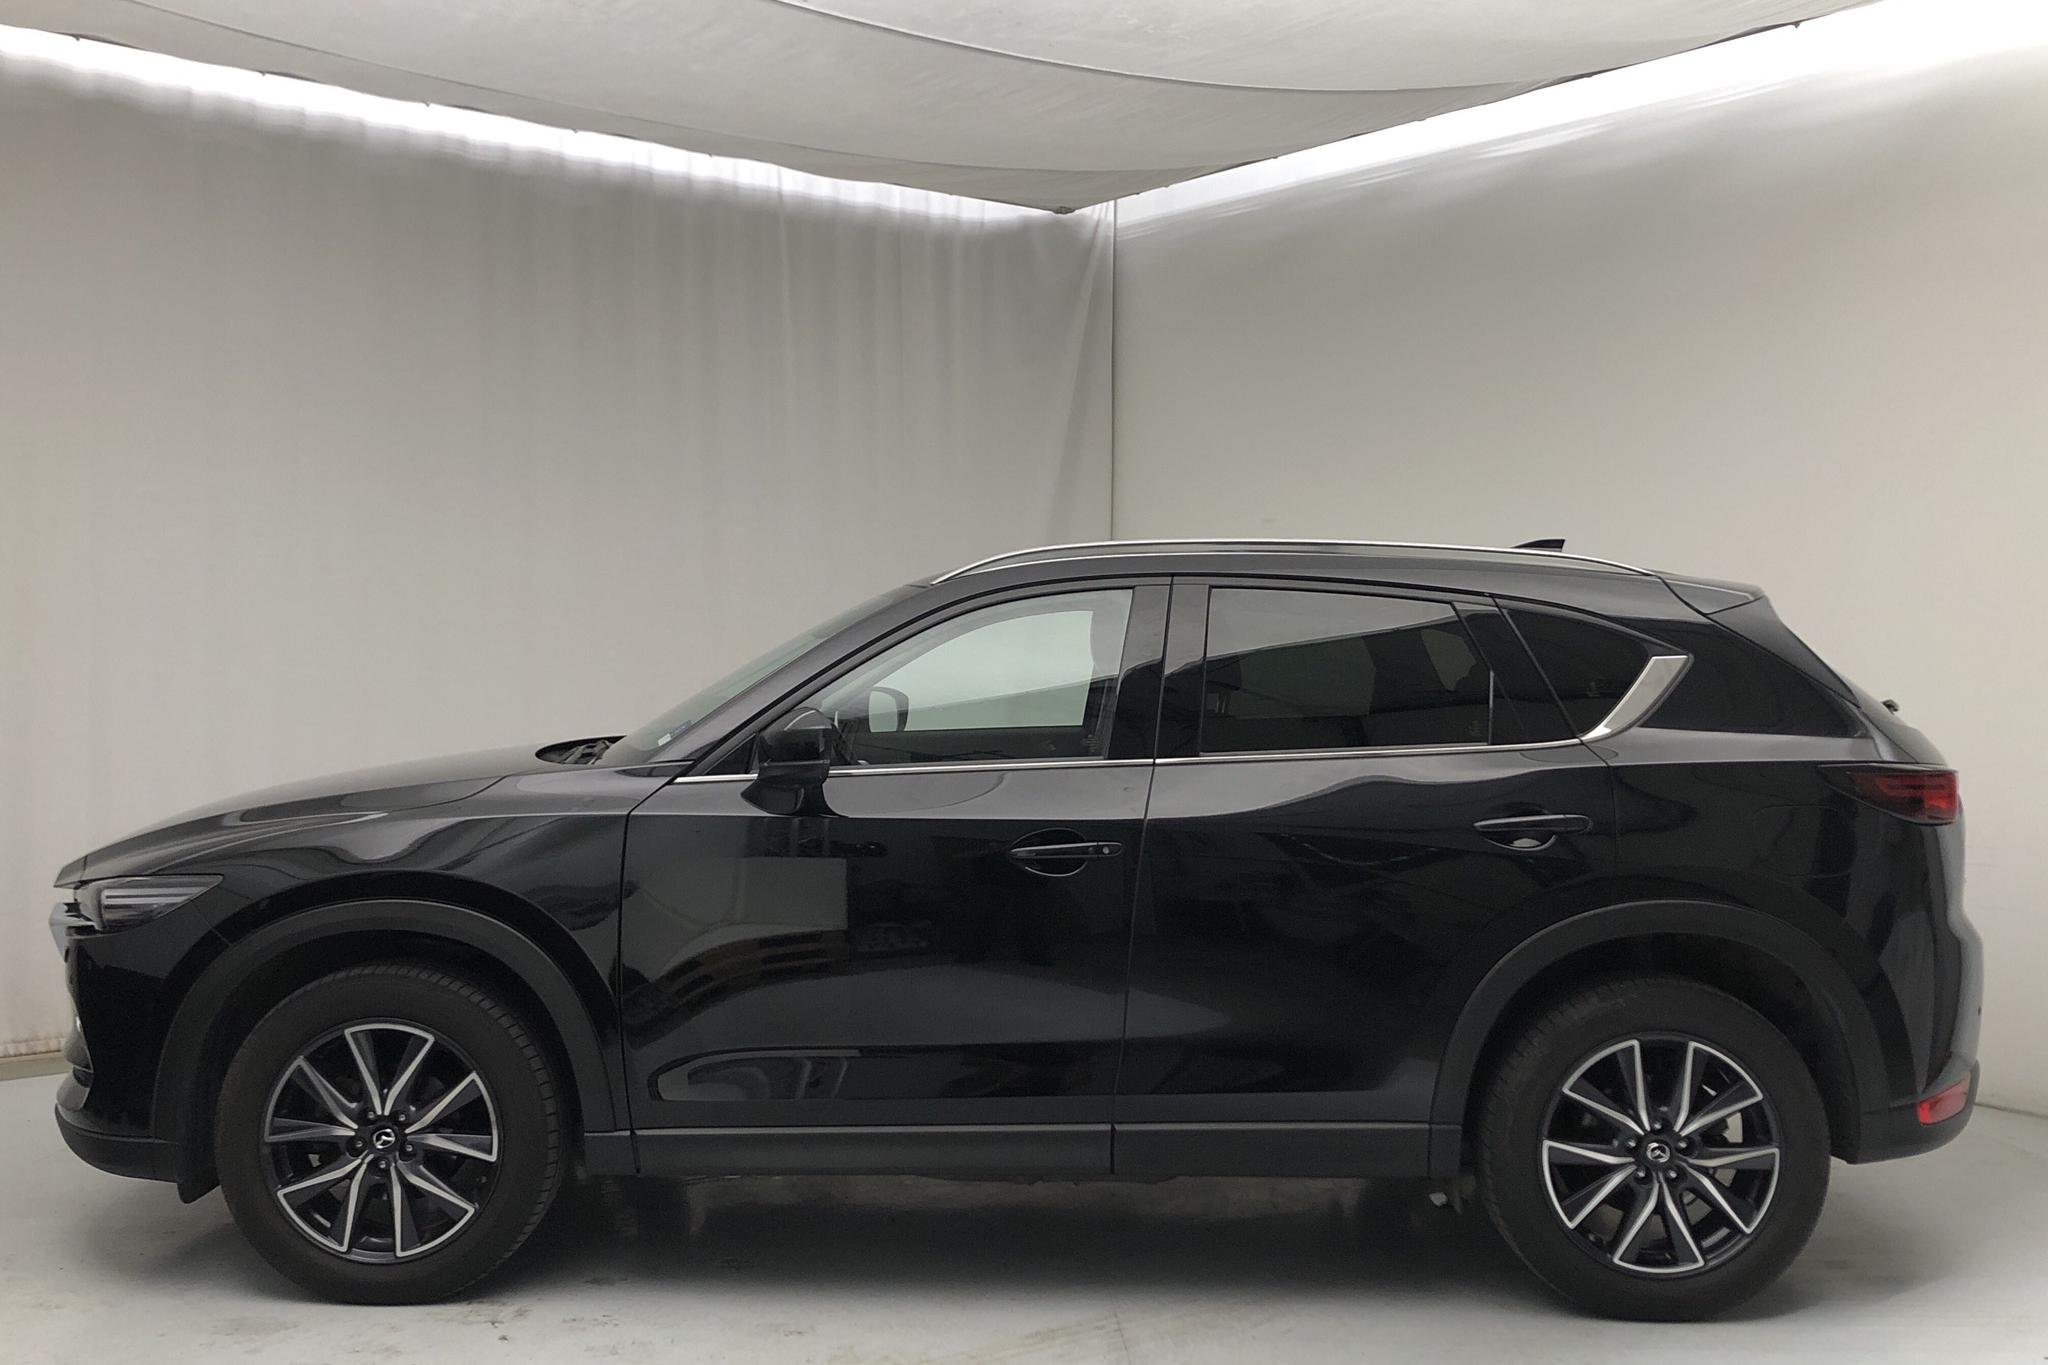 Mazda CX-5 2.5 AWD (194hk) - 6 290 mil - Automat - svart - 2018